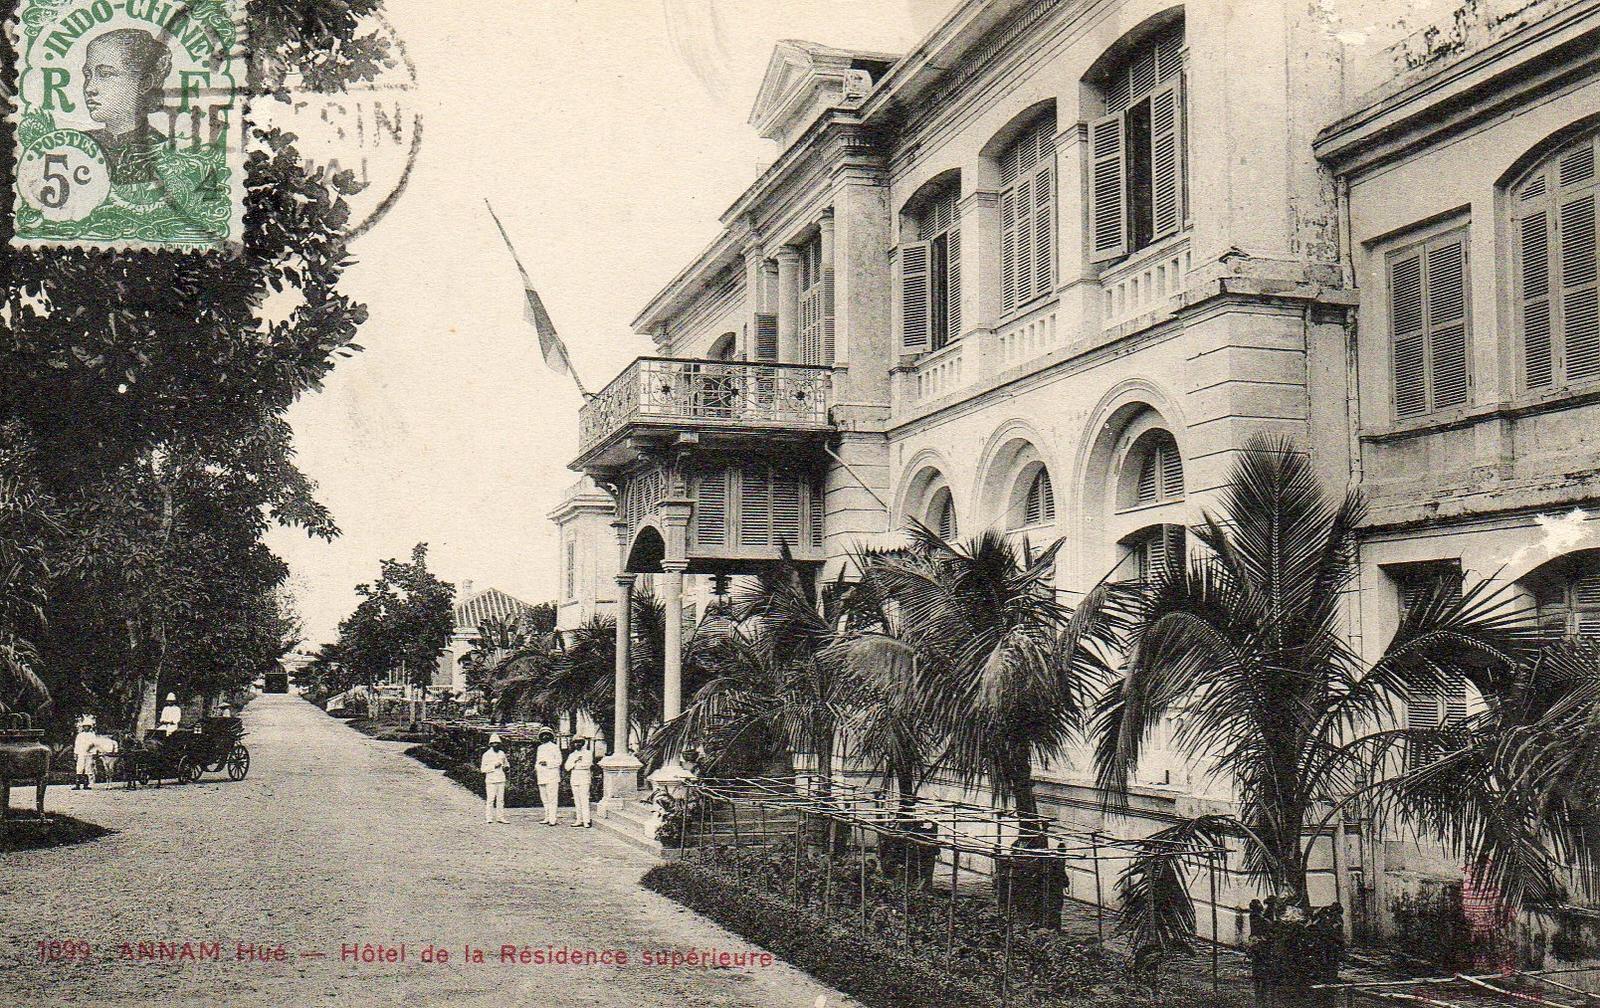 Hué -  hotel de la  residence superieure  a Hue